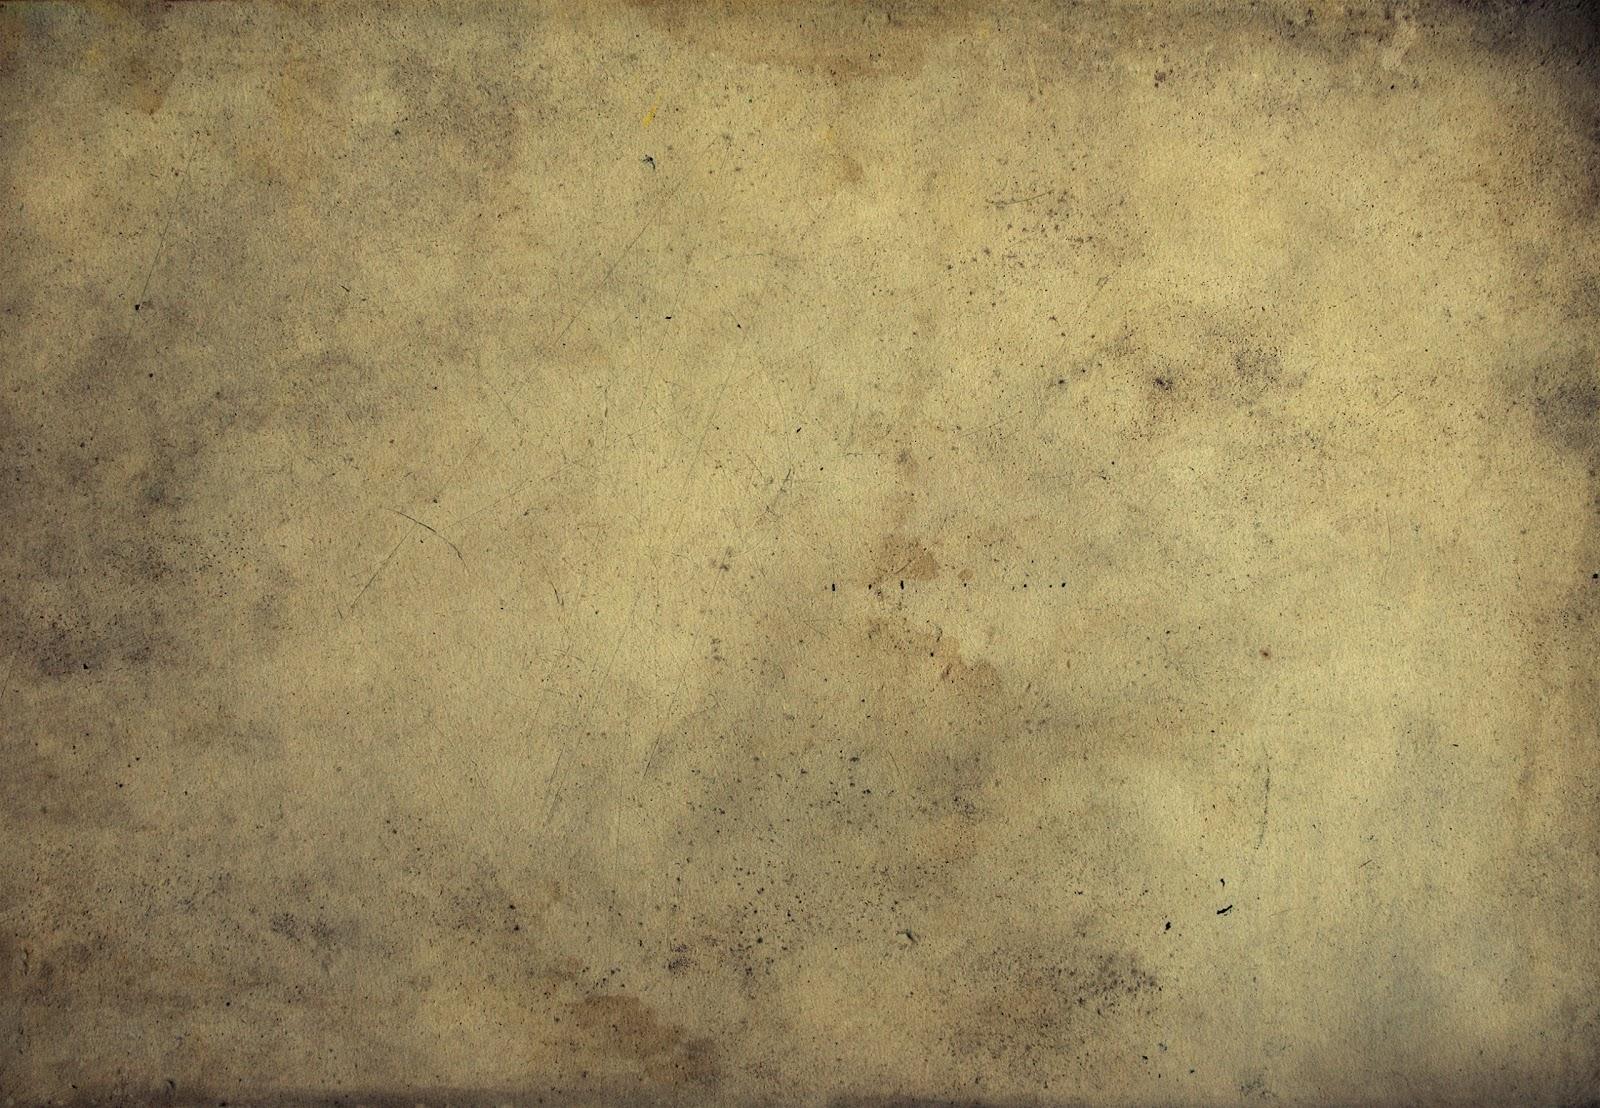 Hd Desktop Wallpapers Old Paper 6 2600 X 1800 Pixels